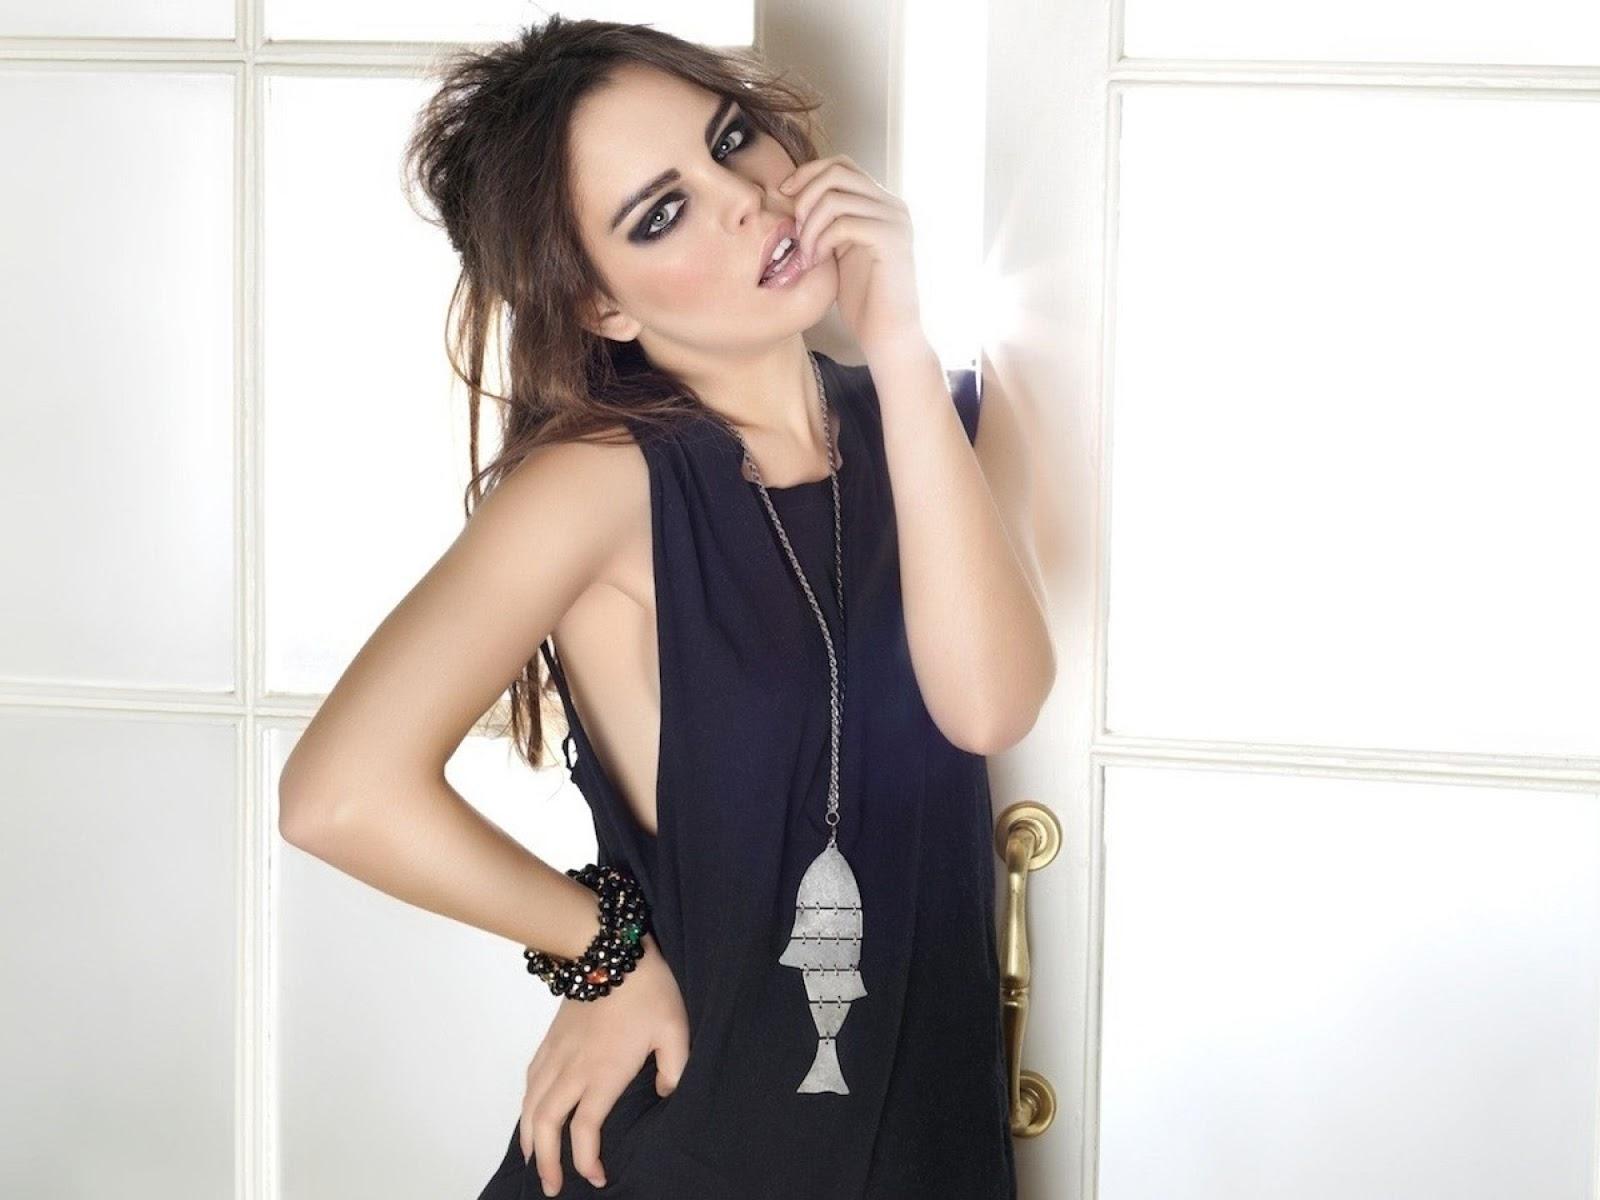 miss eva model crush barbara palvin